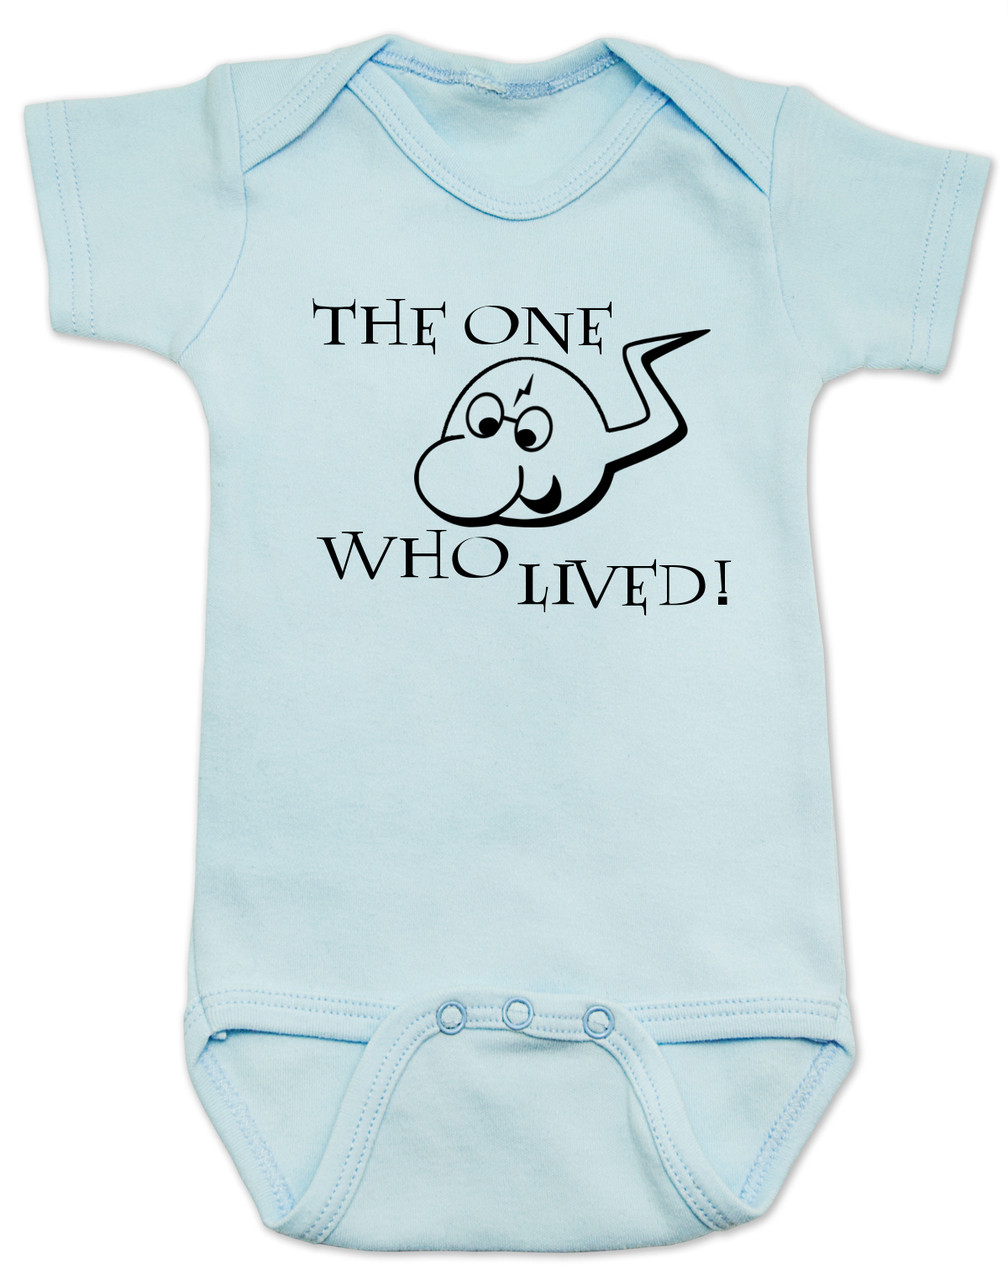 Always Symbol Harry Potter Inspired Baby Vest  Babygrow Baby Shower Gifts